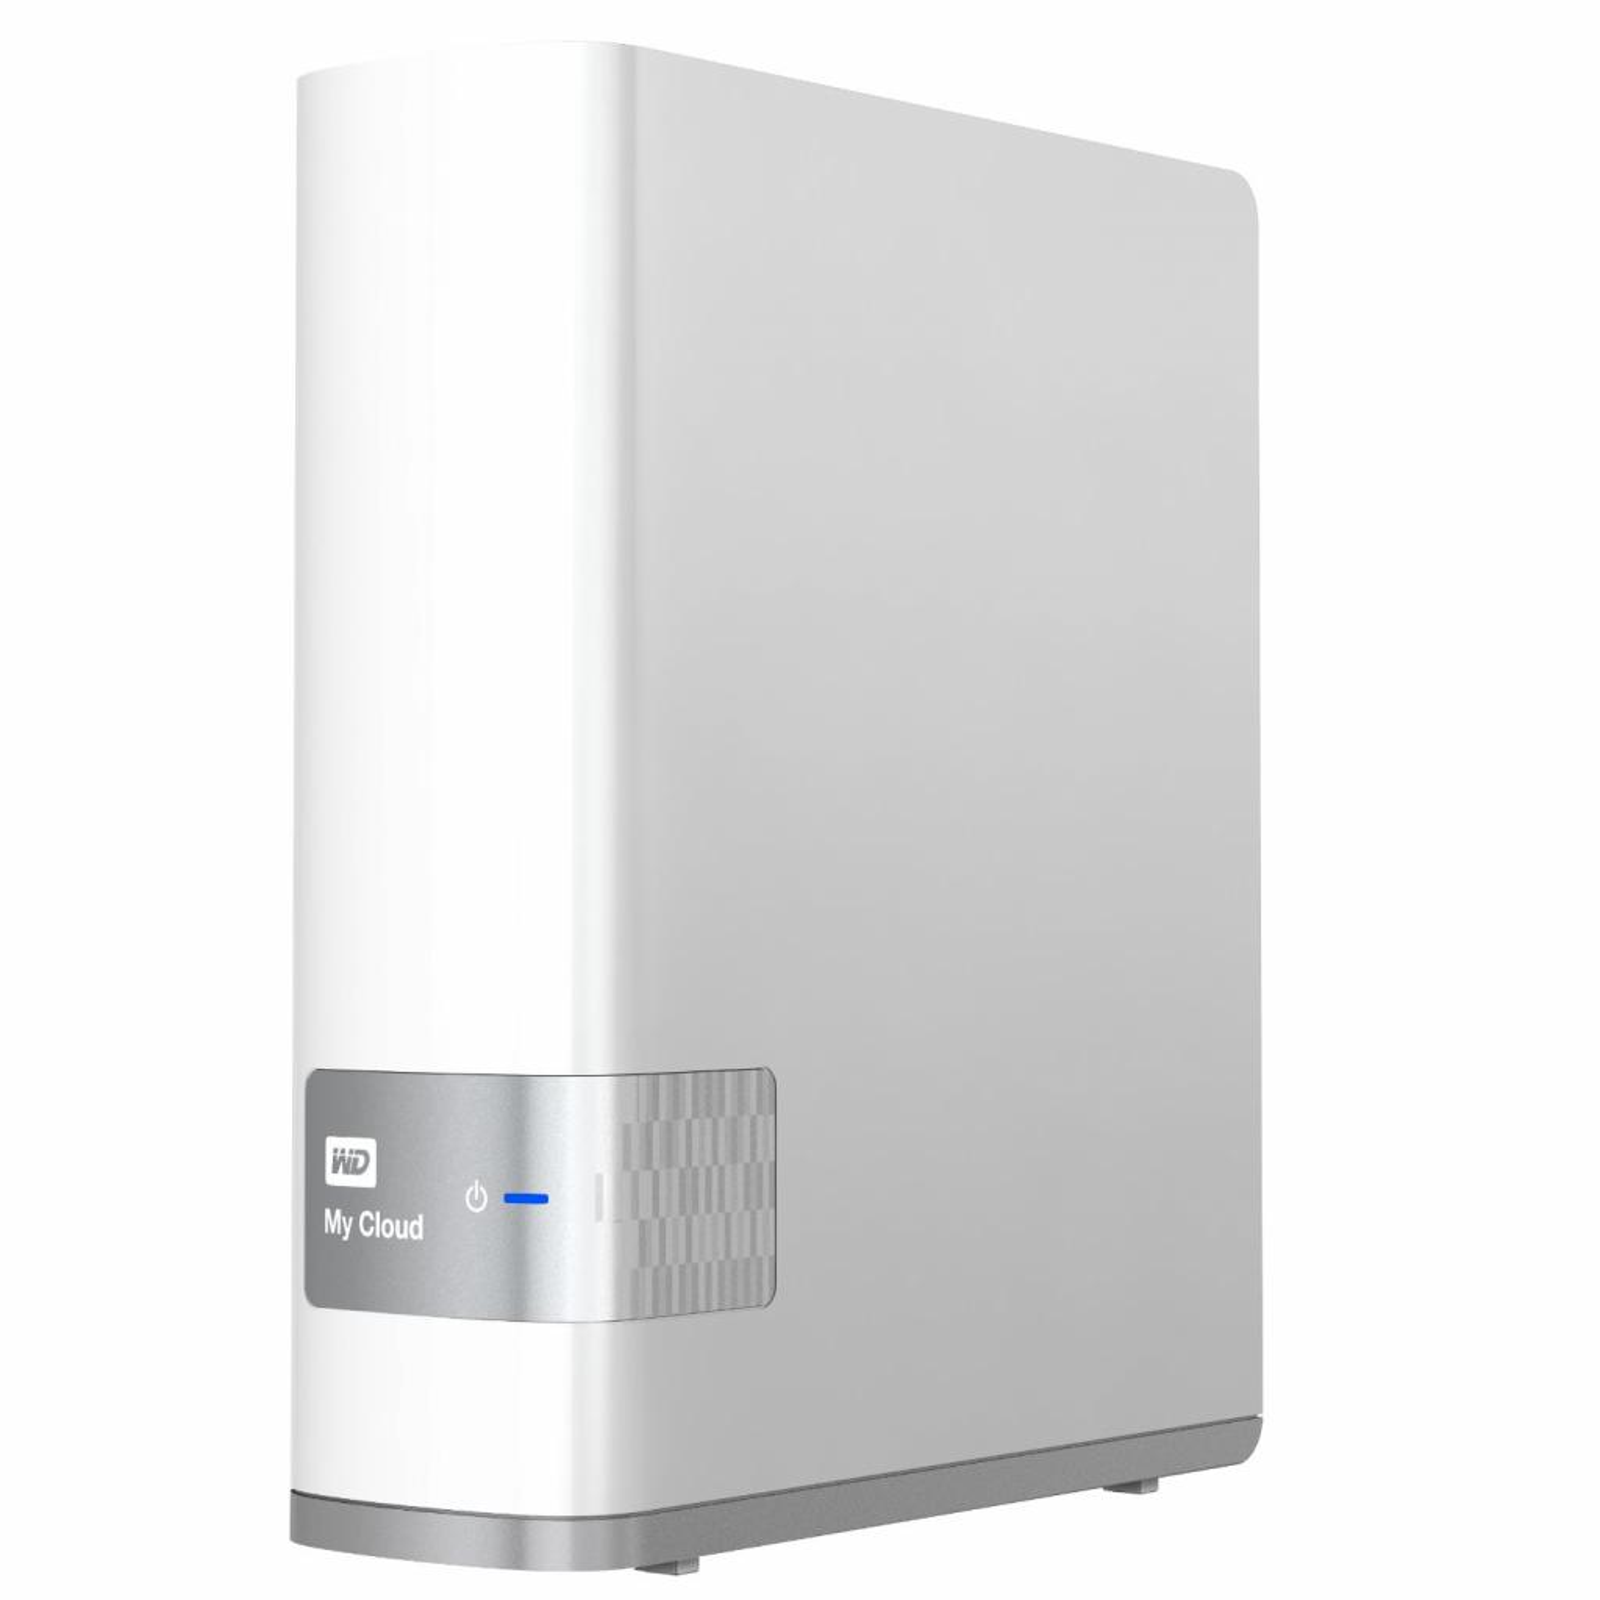 "NAS 3.5"" 4TB Western Digital (WDBCTL0040HWT-EESN) изображение 3"